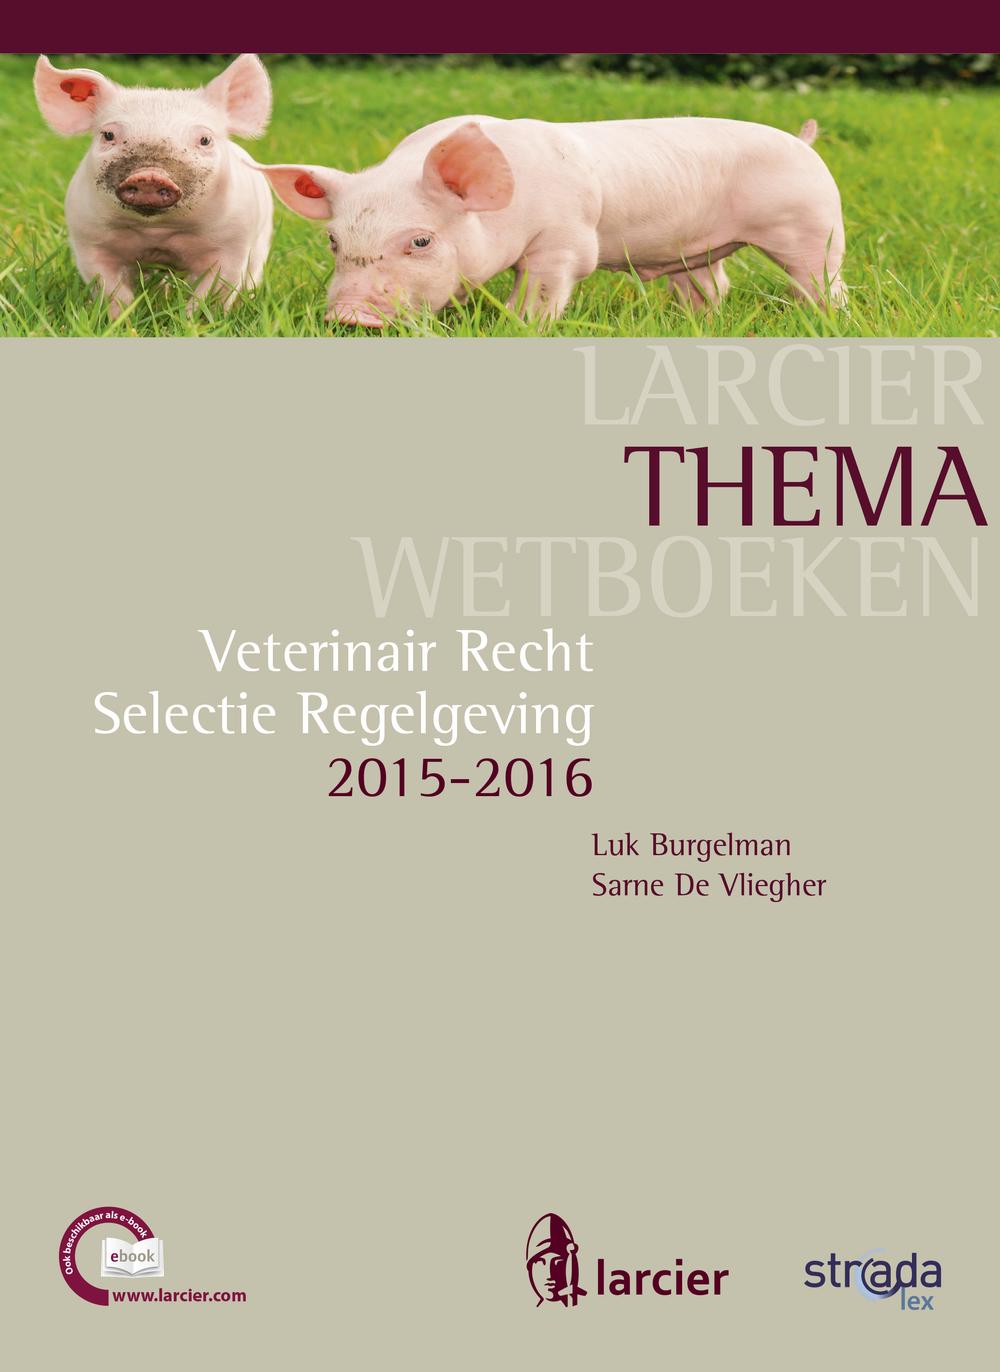 Veterinair recht 2015